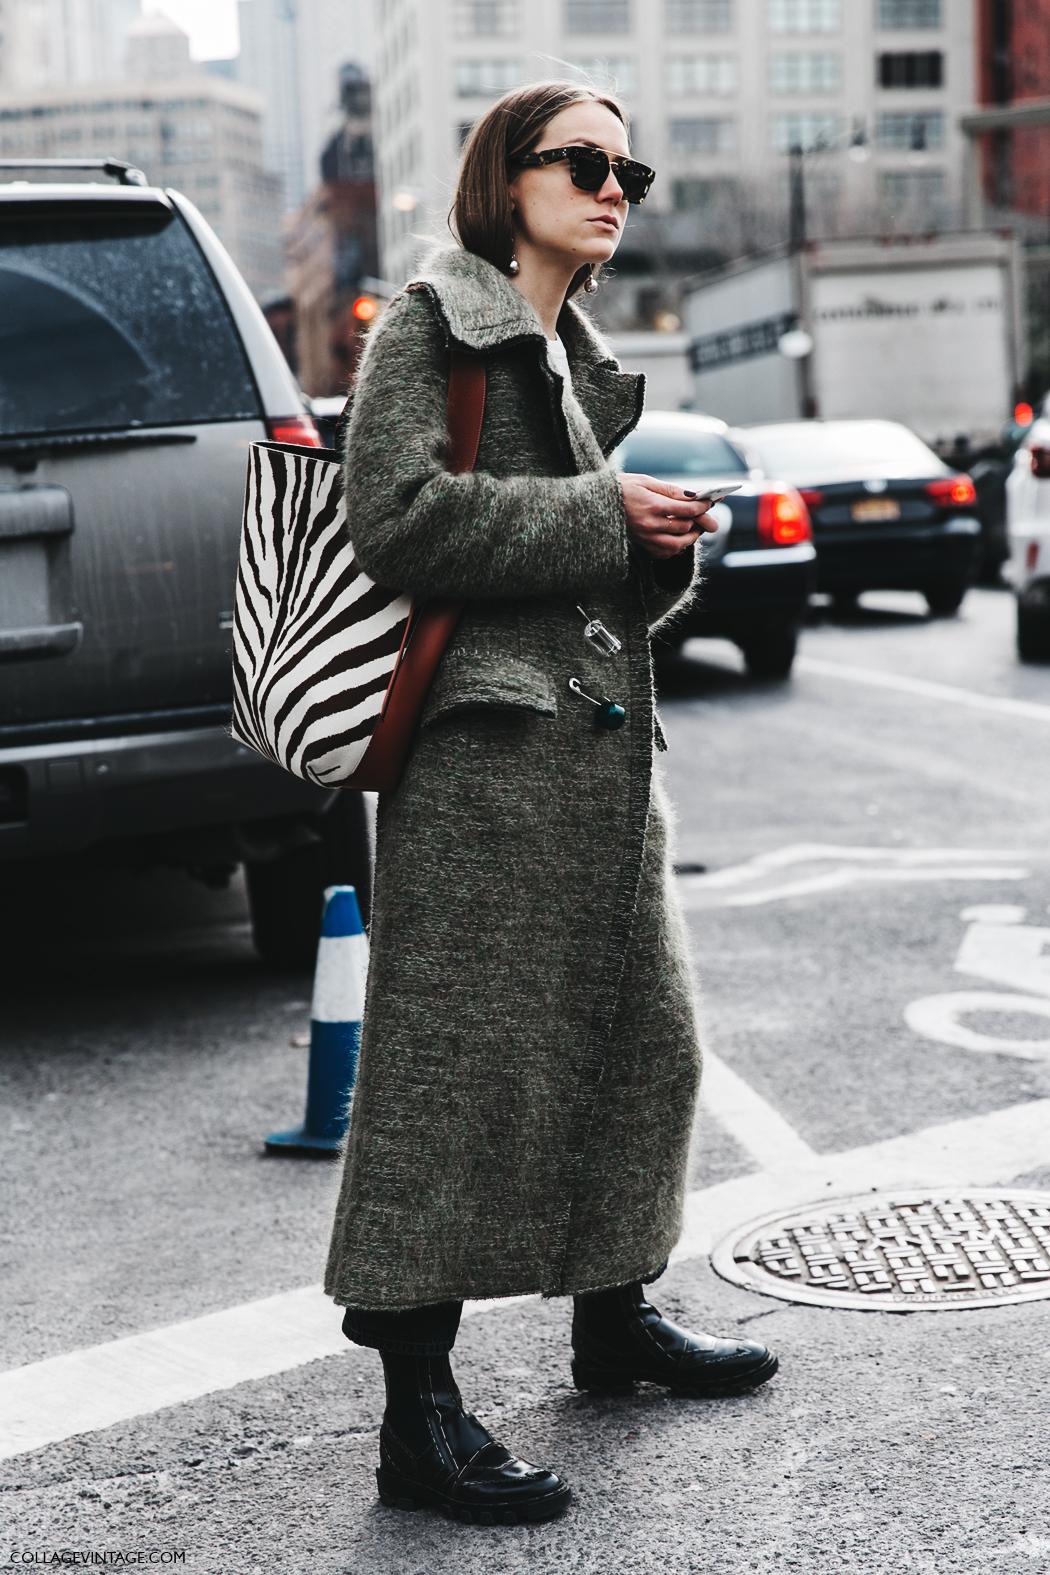 NYFW-New_York_Fashion_Week-Fall_Winter-17-Street_Style-Acne_Coat